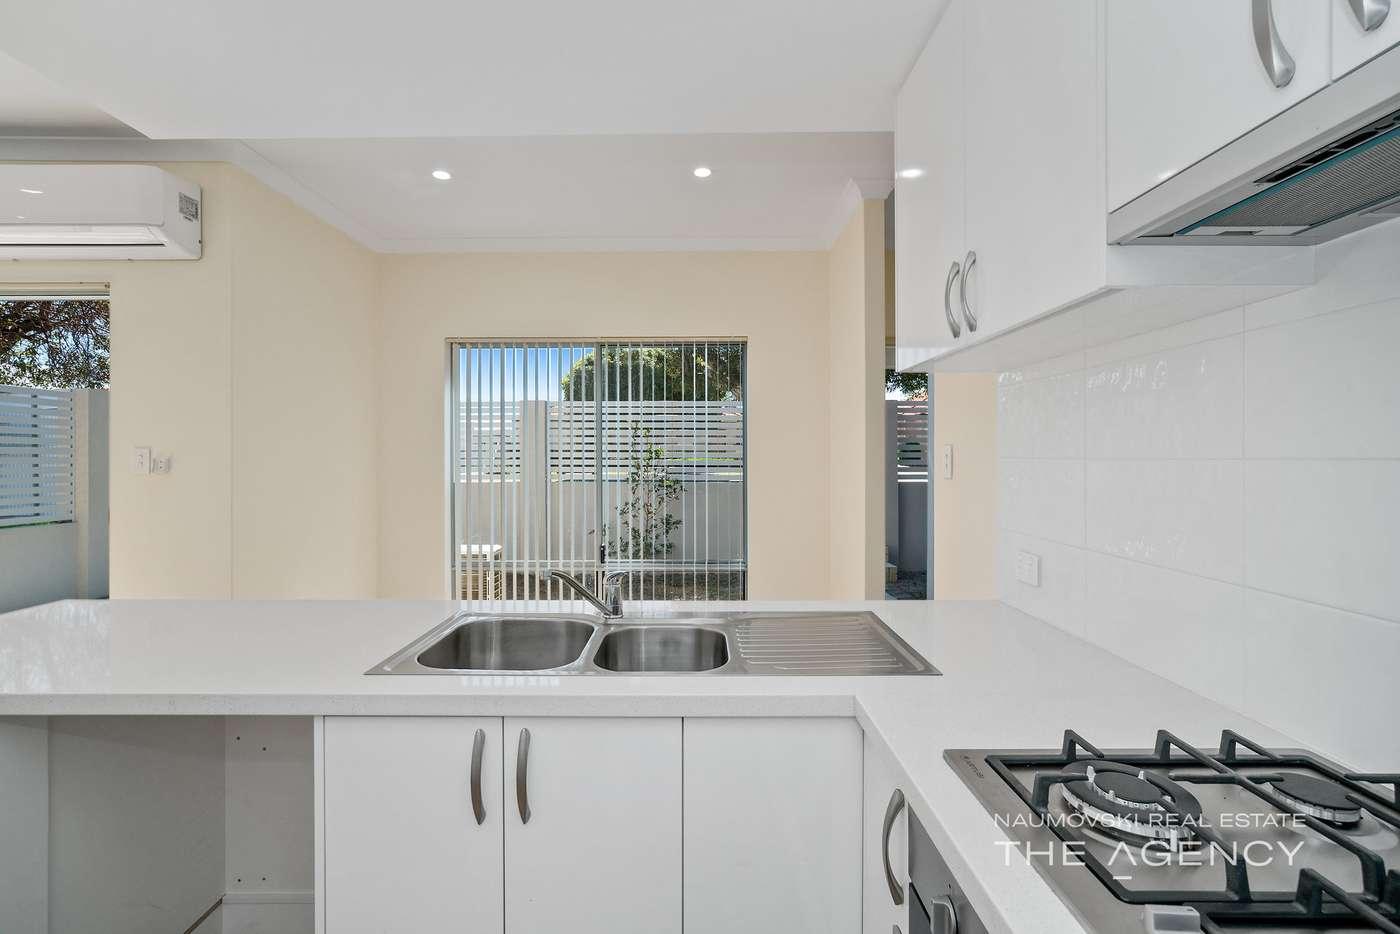 Sixth view of Homely house listing, 1/14 Nollamara Avenue, Nollamara WA 6061